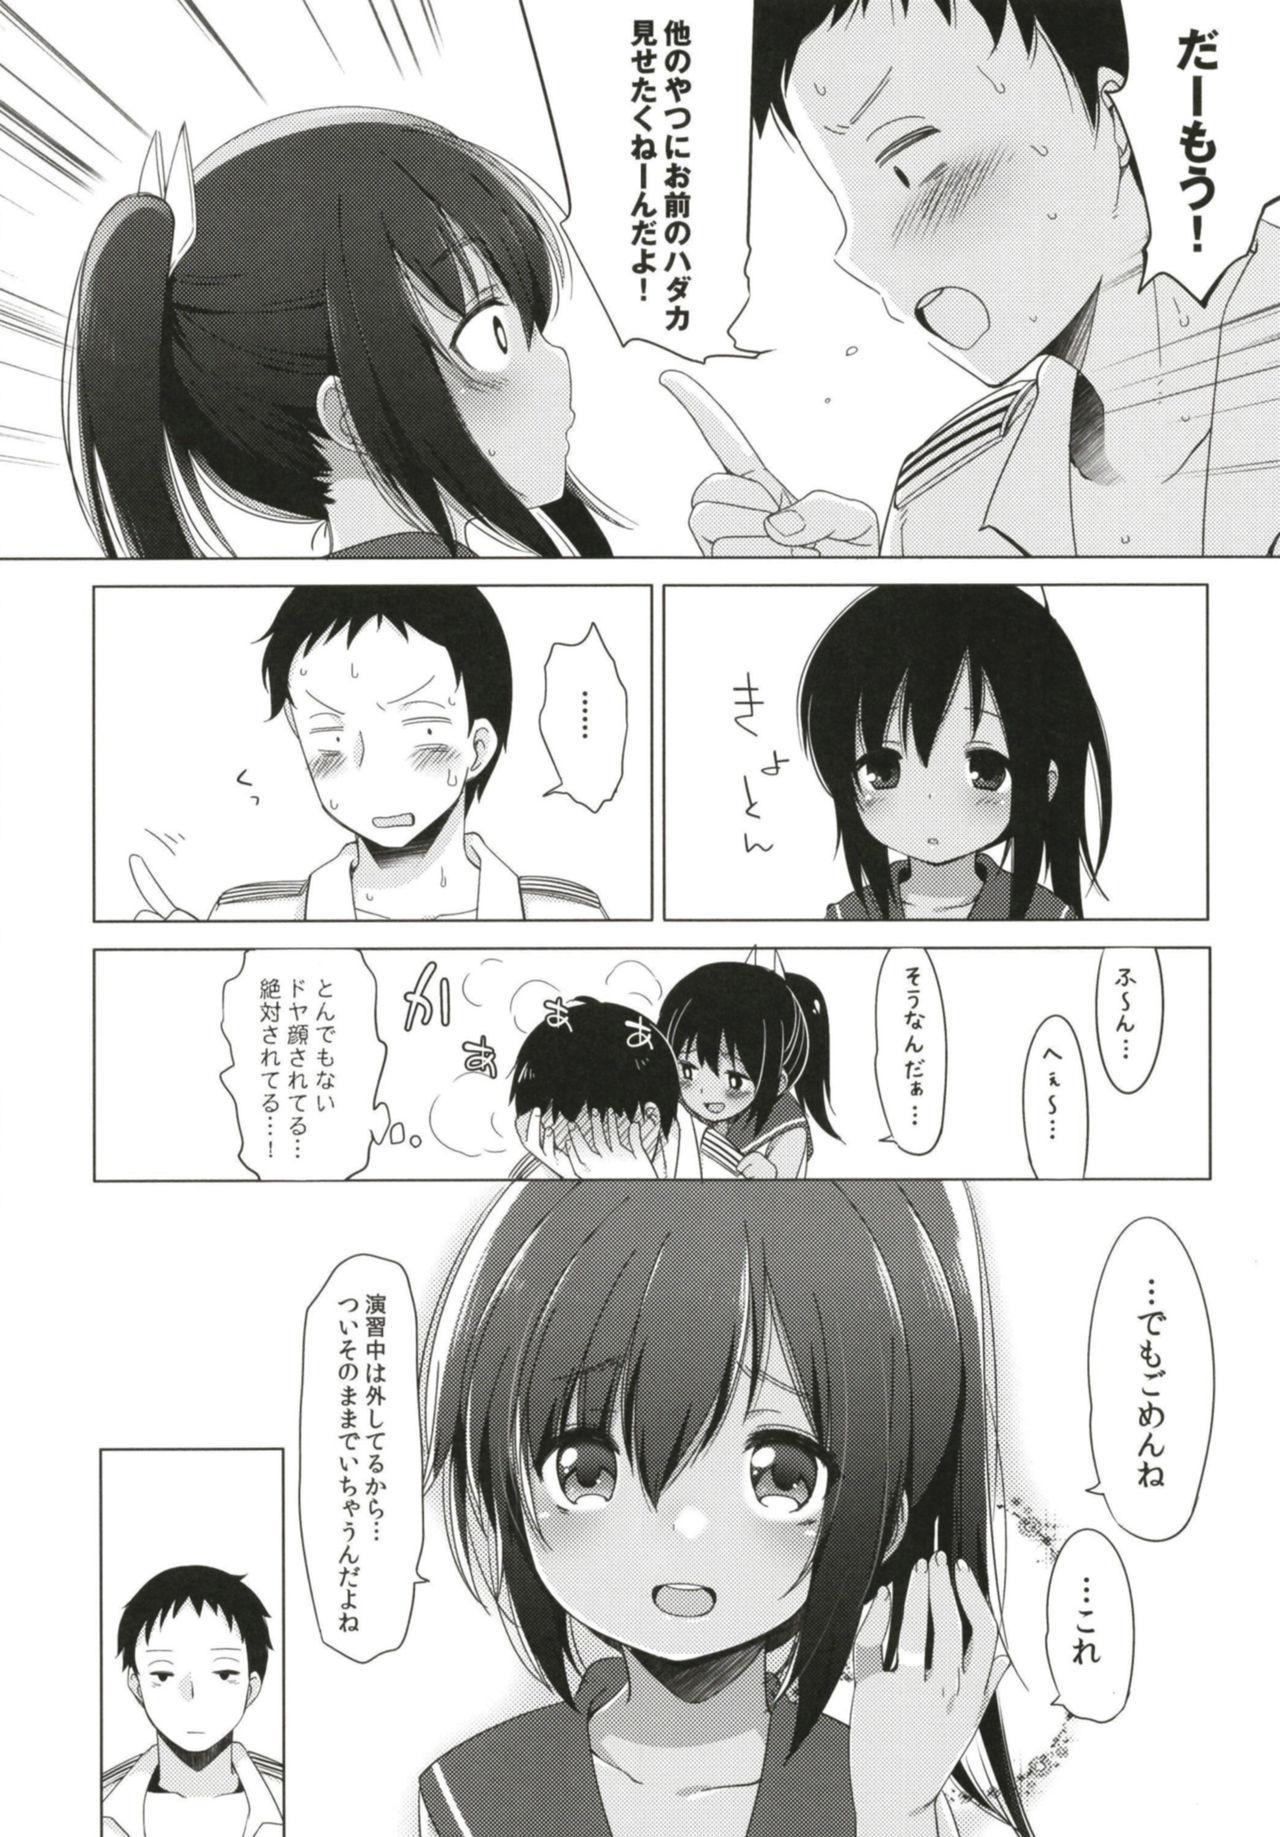 [French letter (Fujisaki Hikari)] Hitonatsu no Ayamachi -I-401 Soushuuhen- (Kantai Collection -KanColle-) [Digital] 21